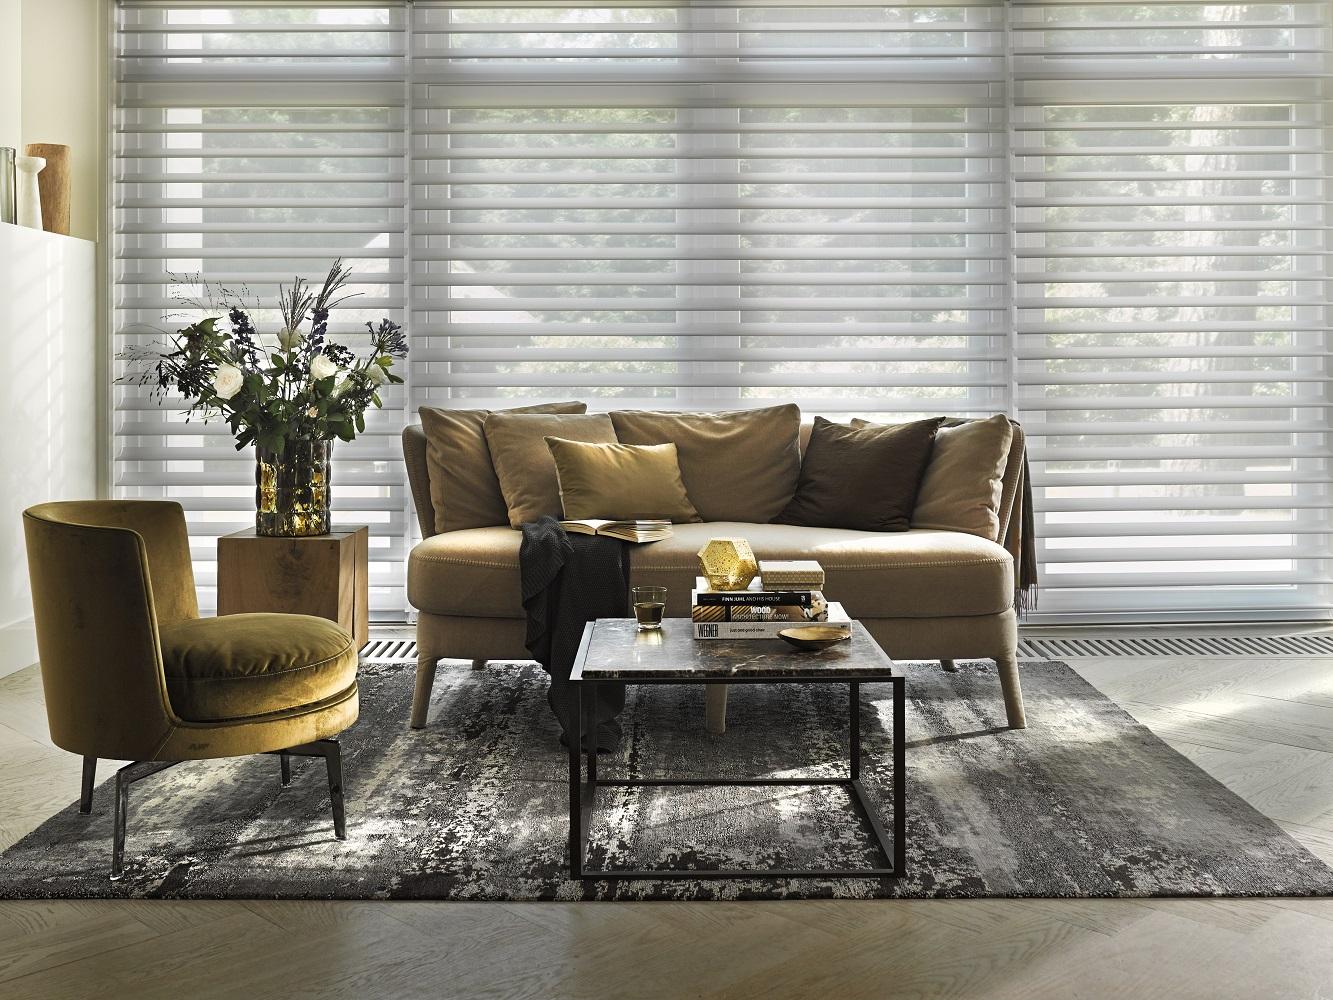 White Silhouette Room